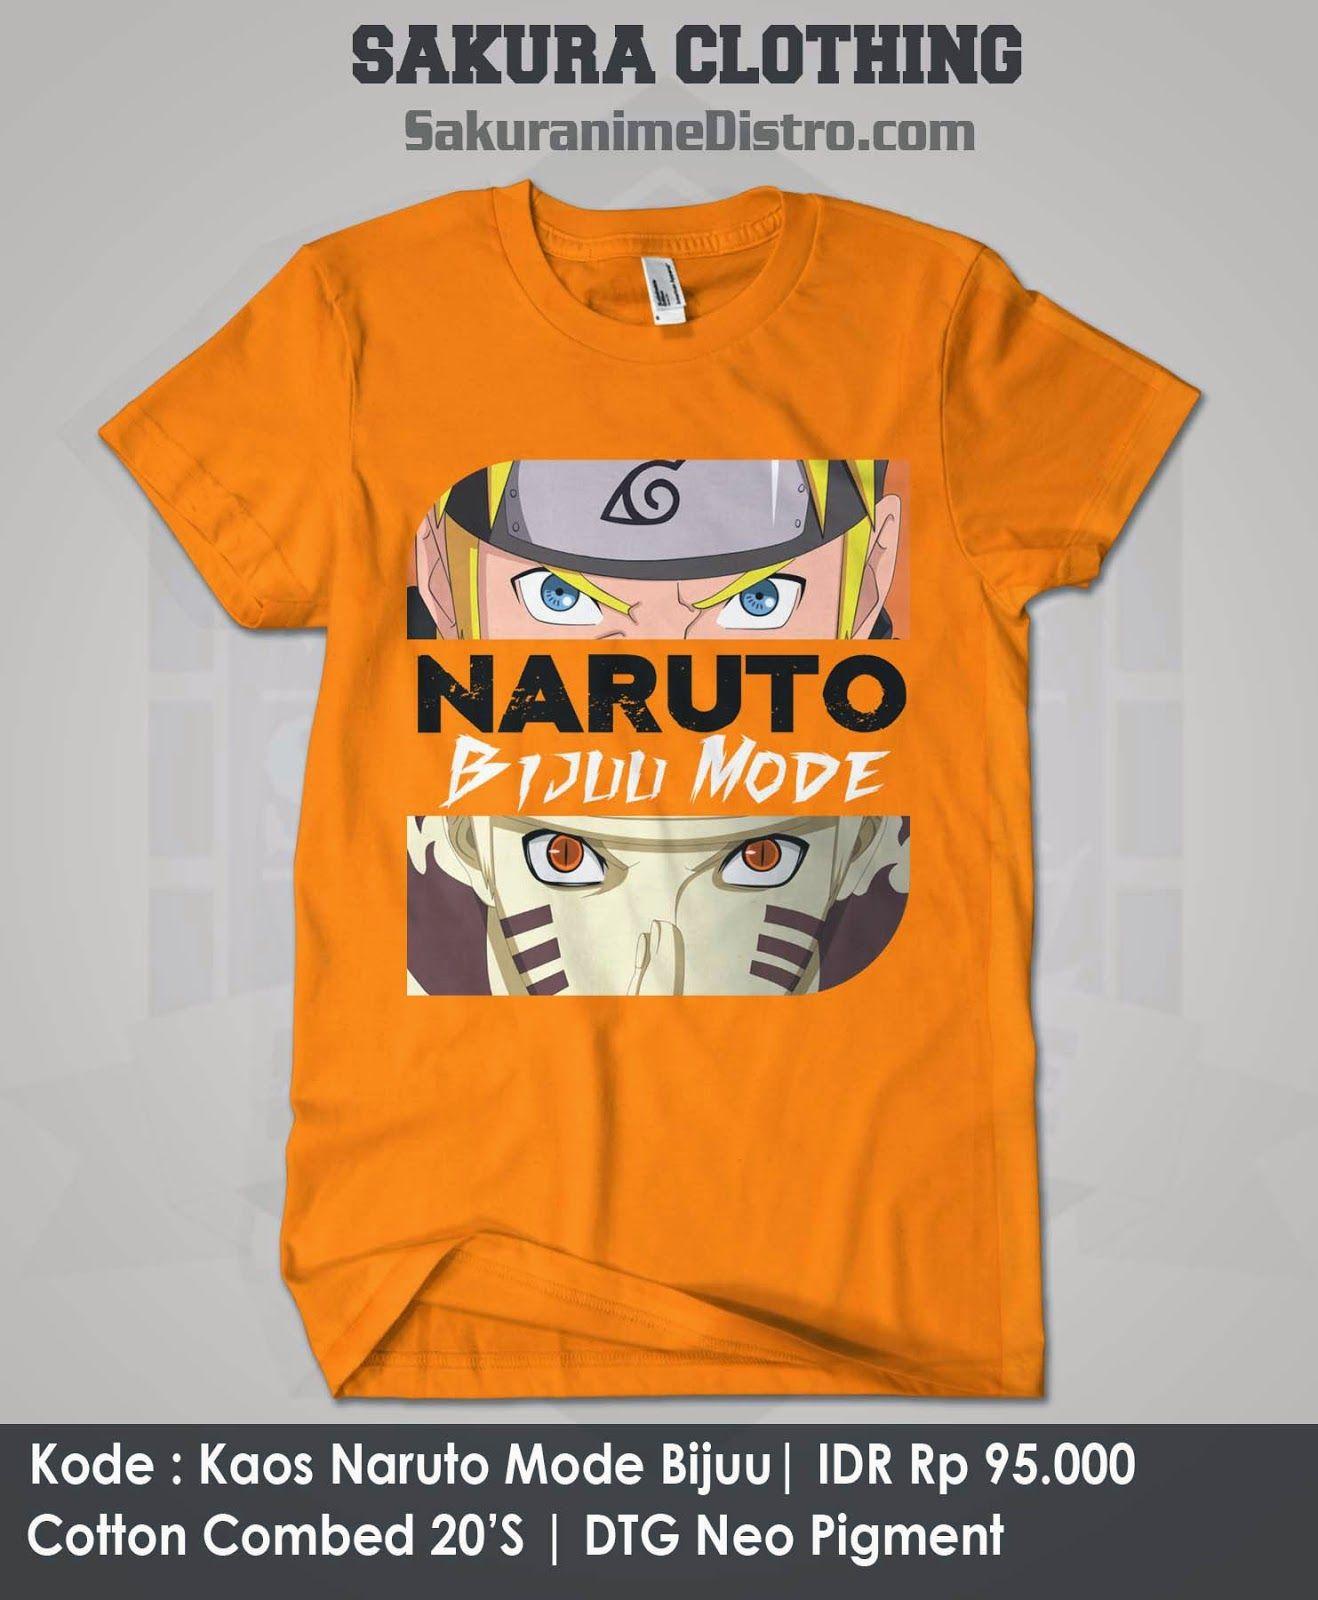 Jual Kaos Anime Naruto Mode Bijuu Minat hubungi